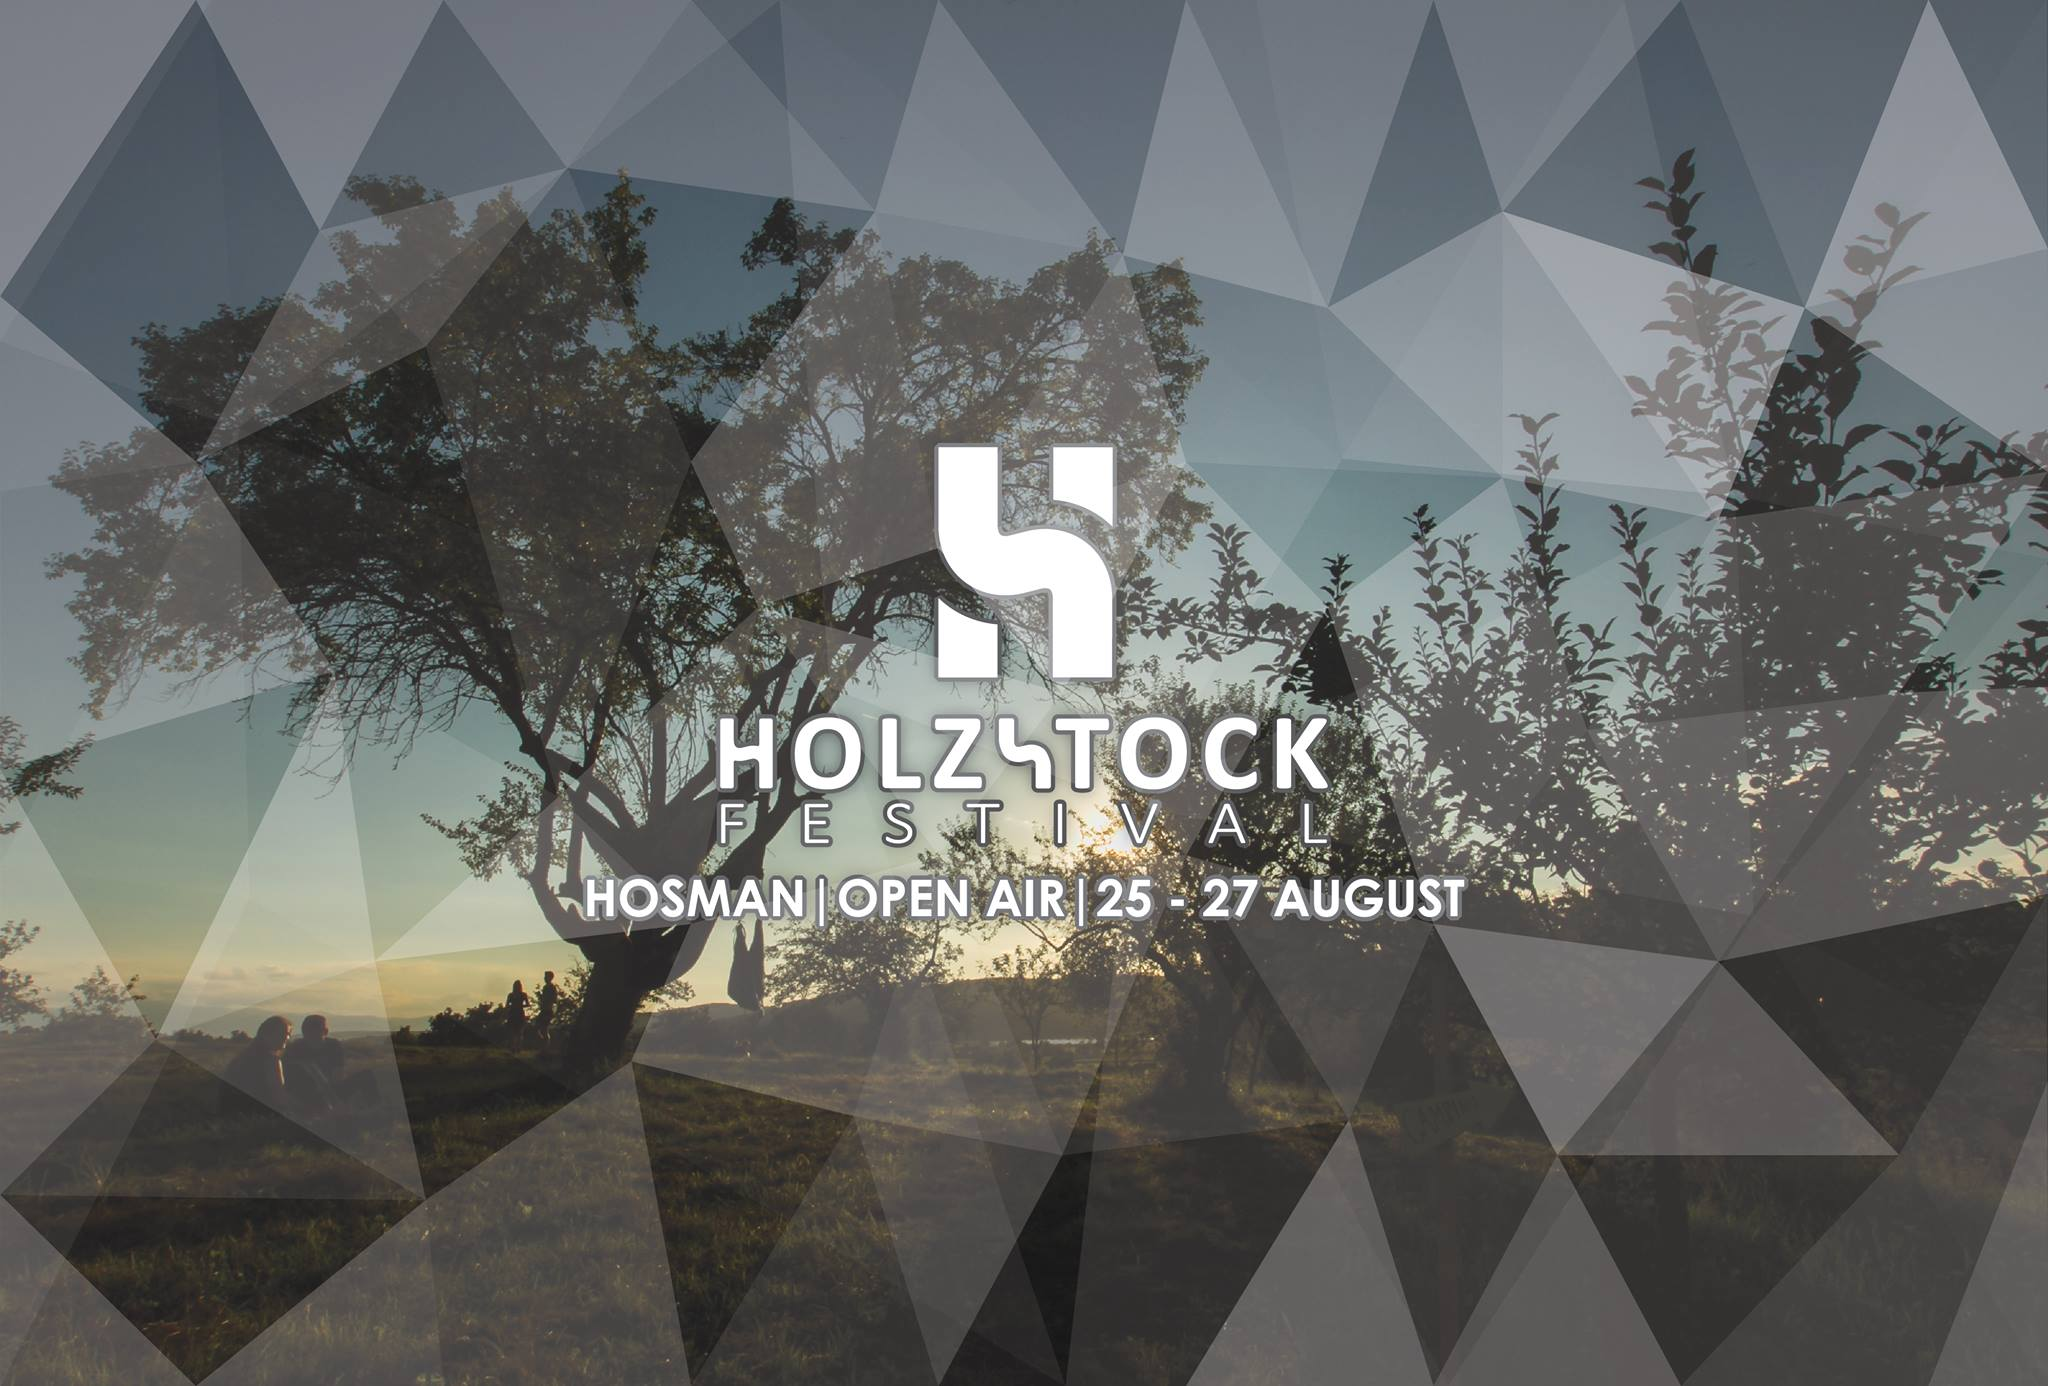 Holzstock Festival 2017